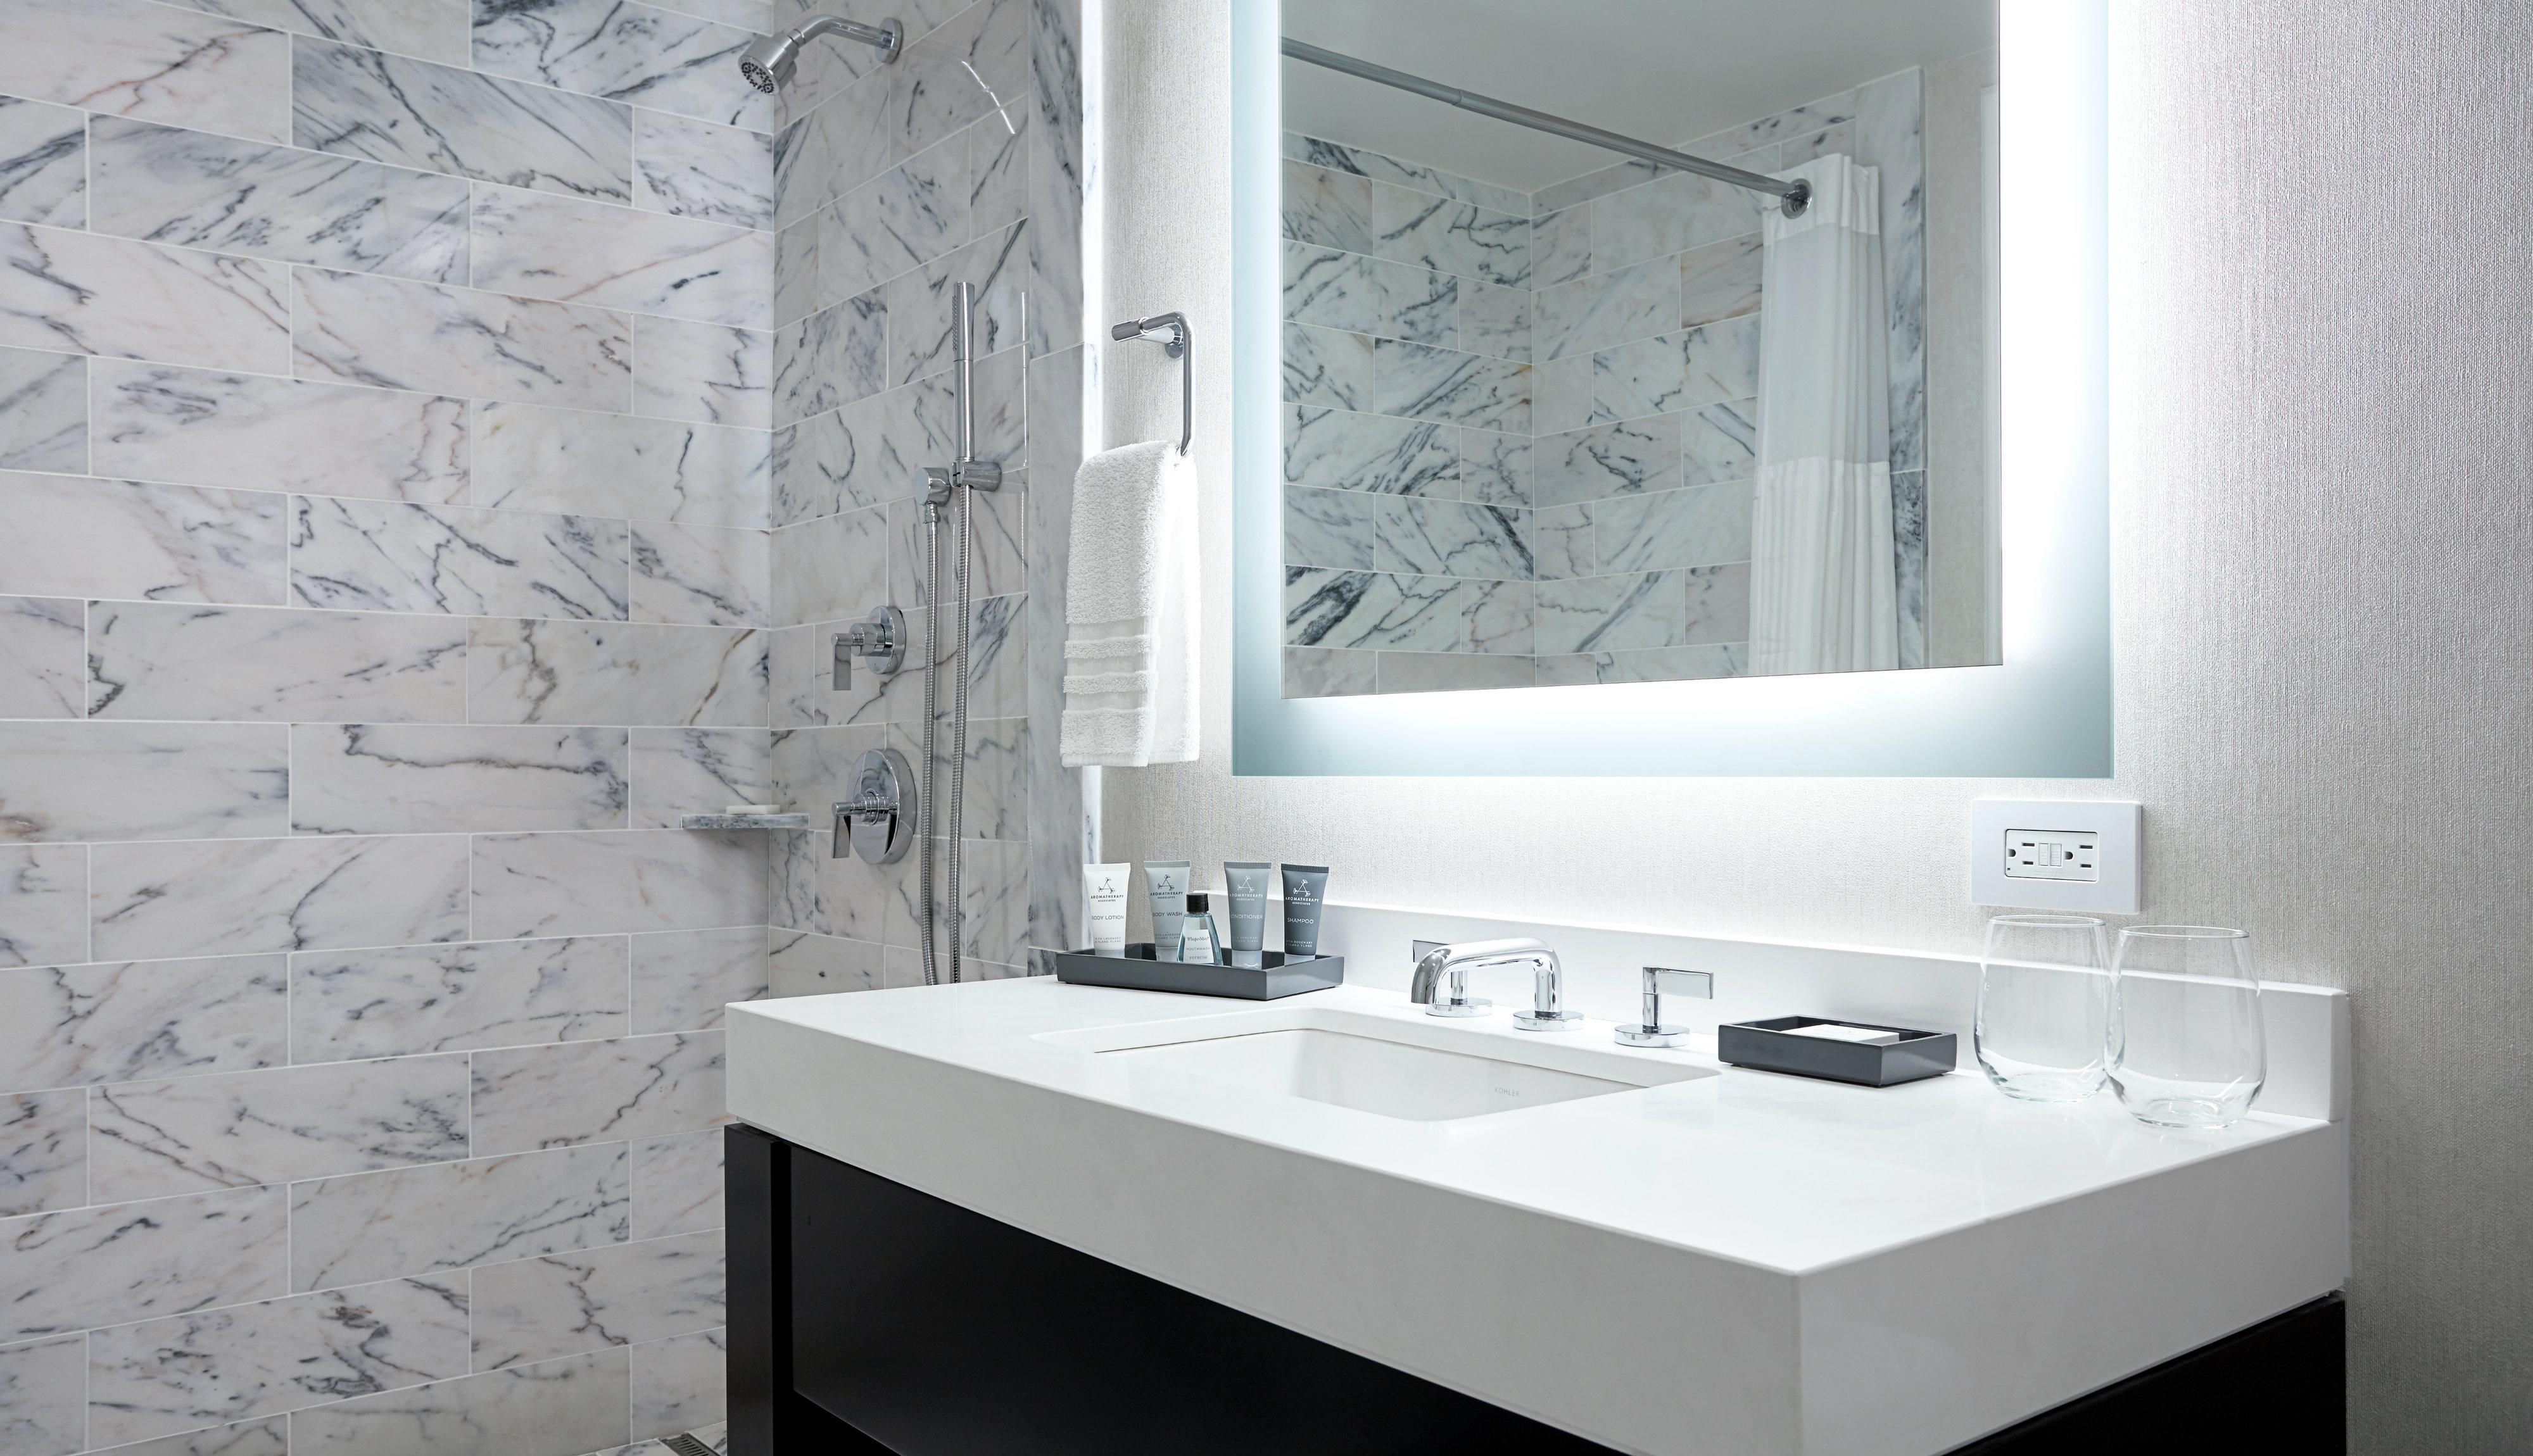 JW Marriott Essex House New York Central Park bathroom suite